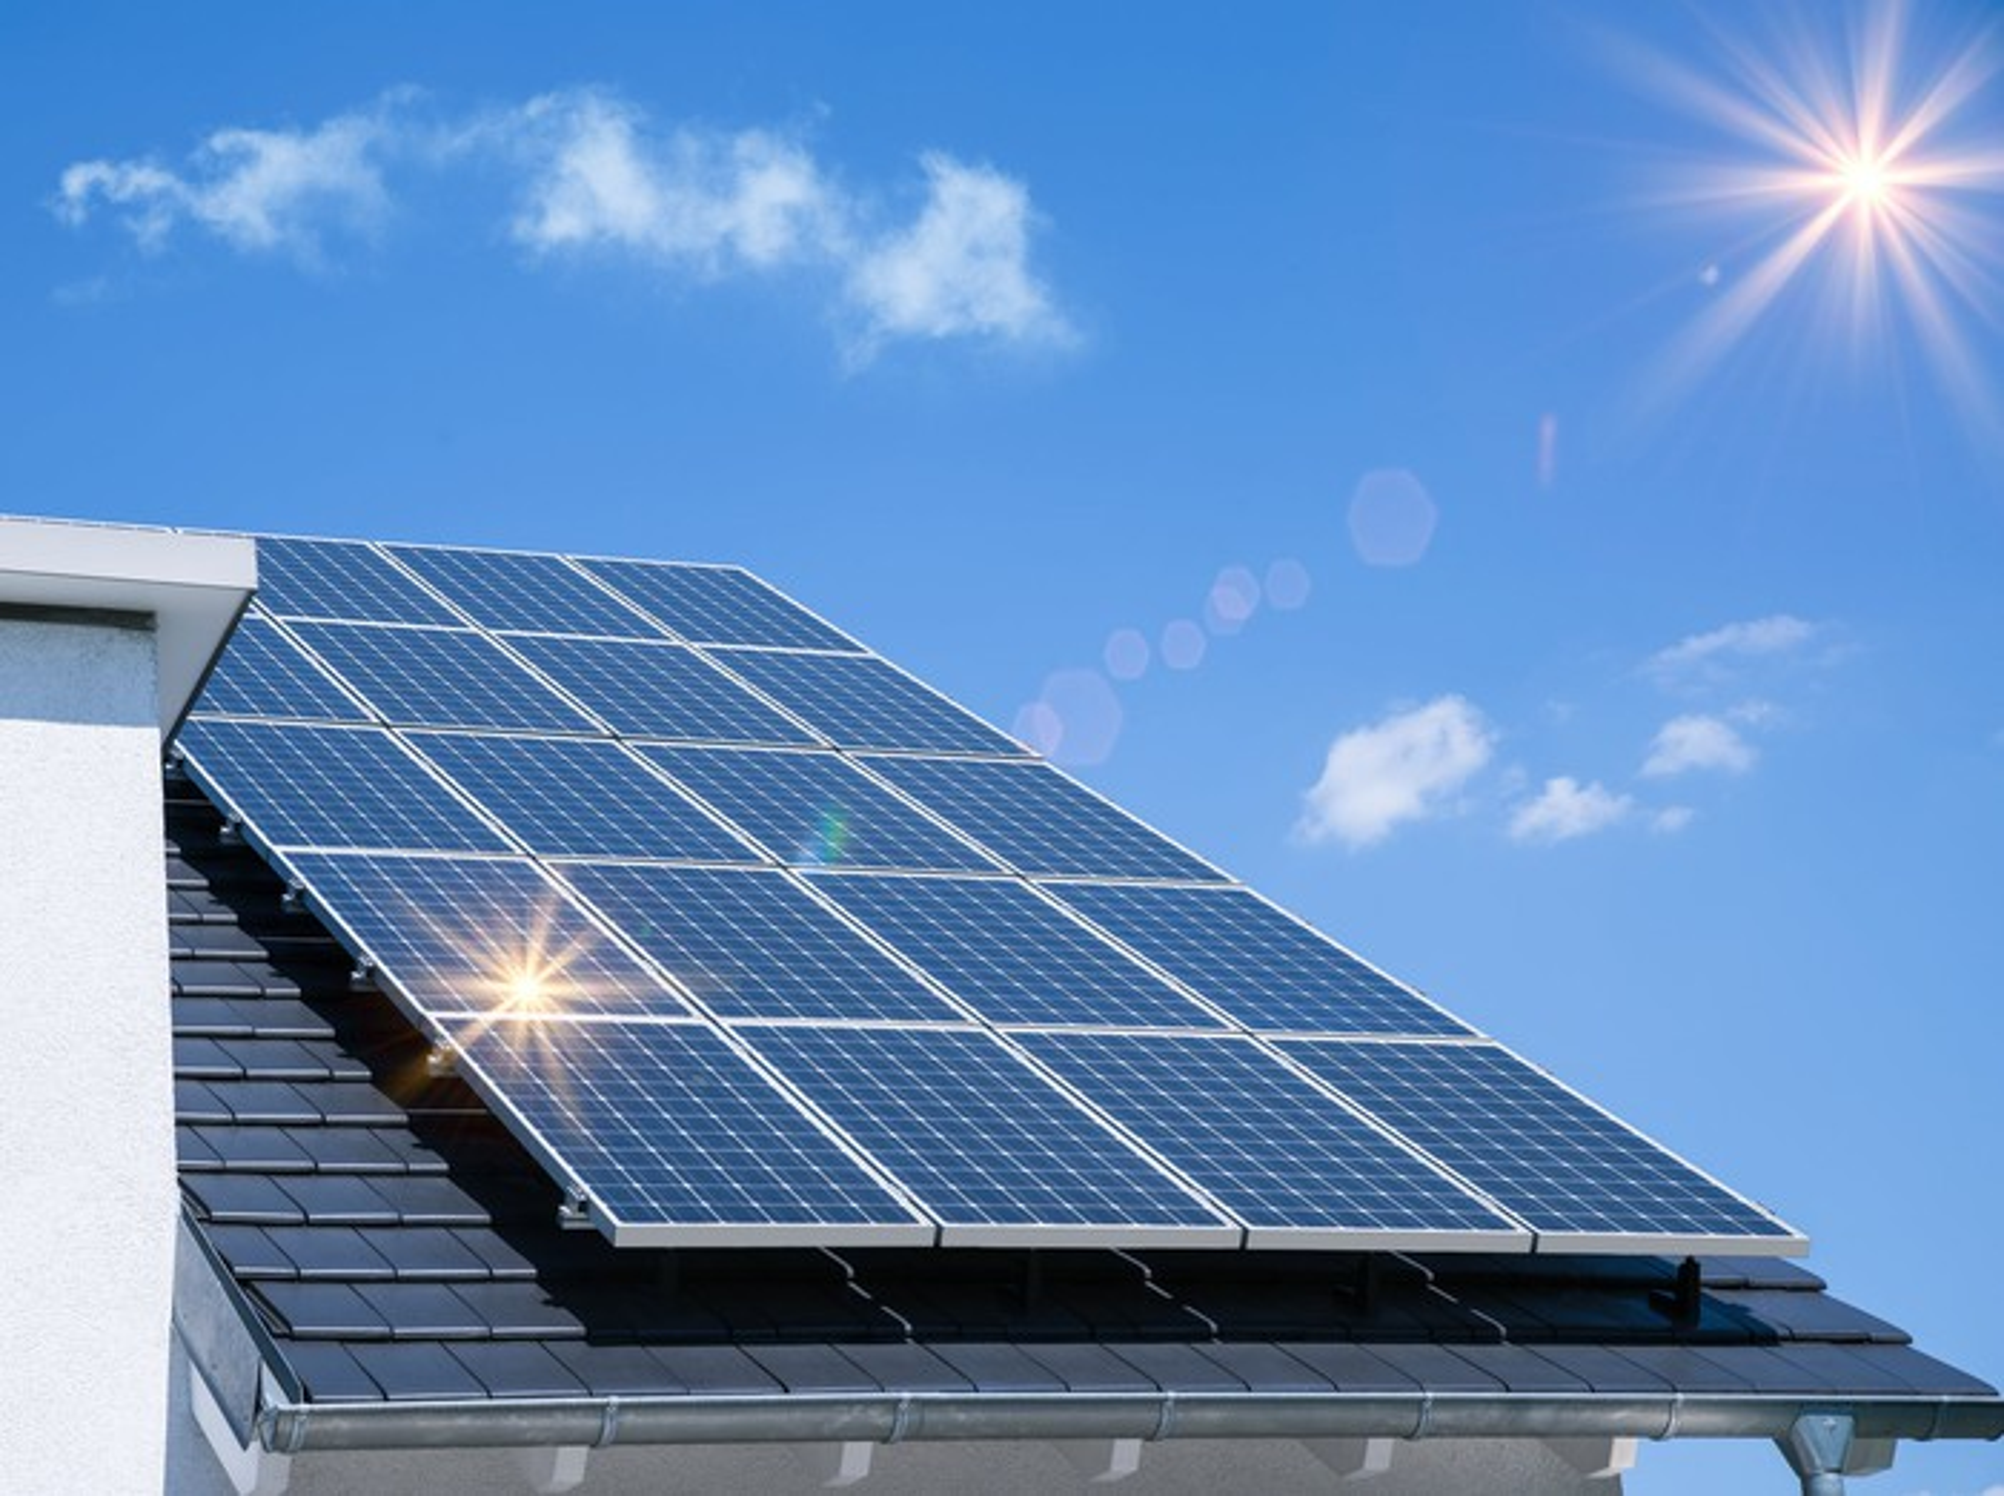 Rooftop solar energy panels